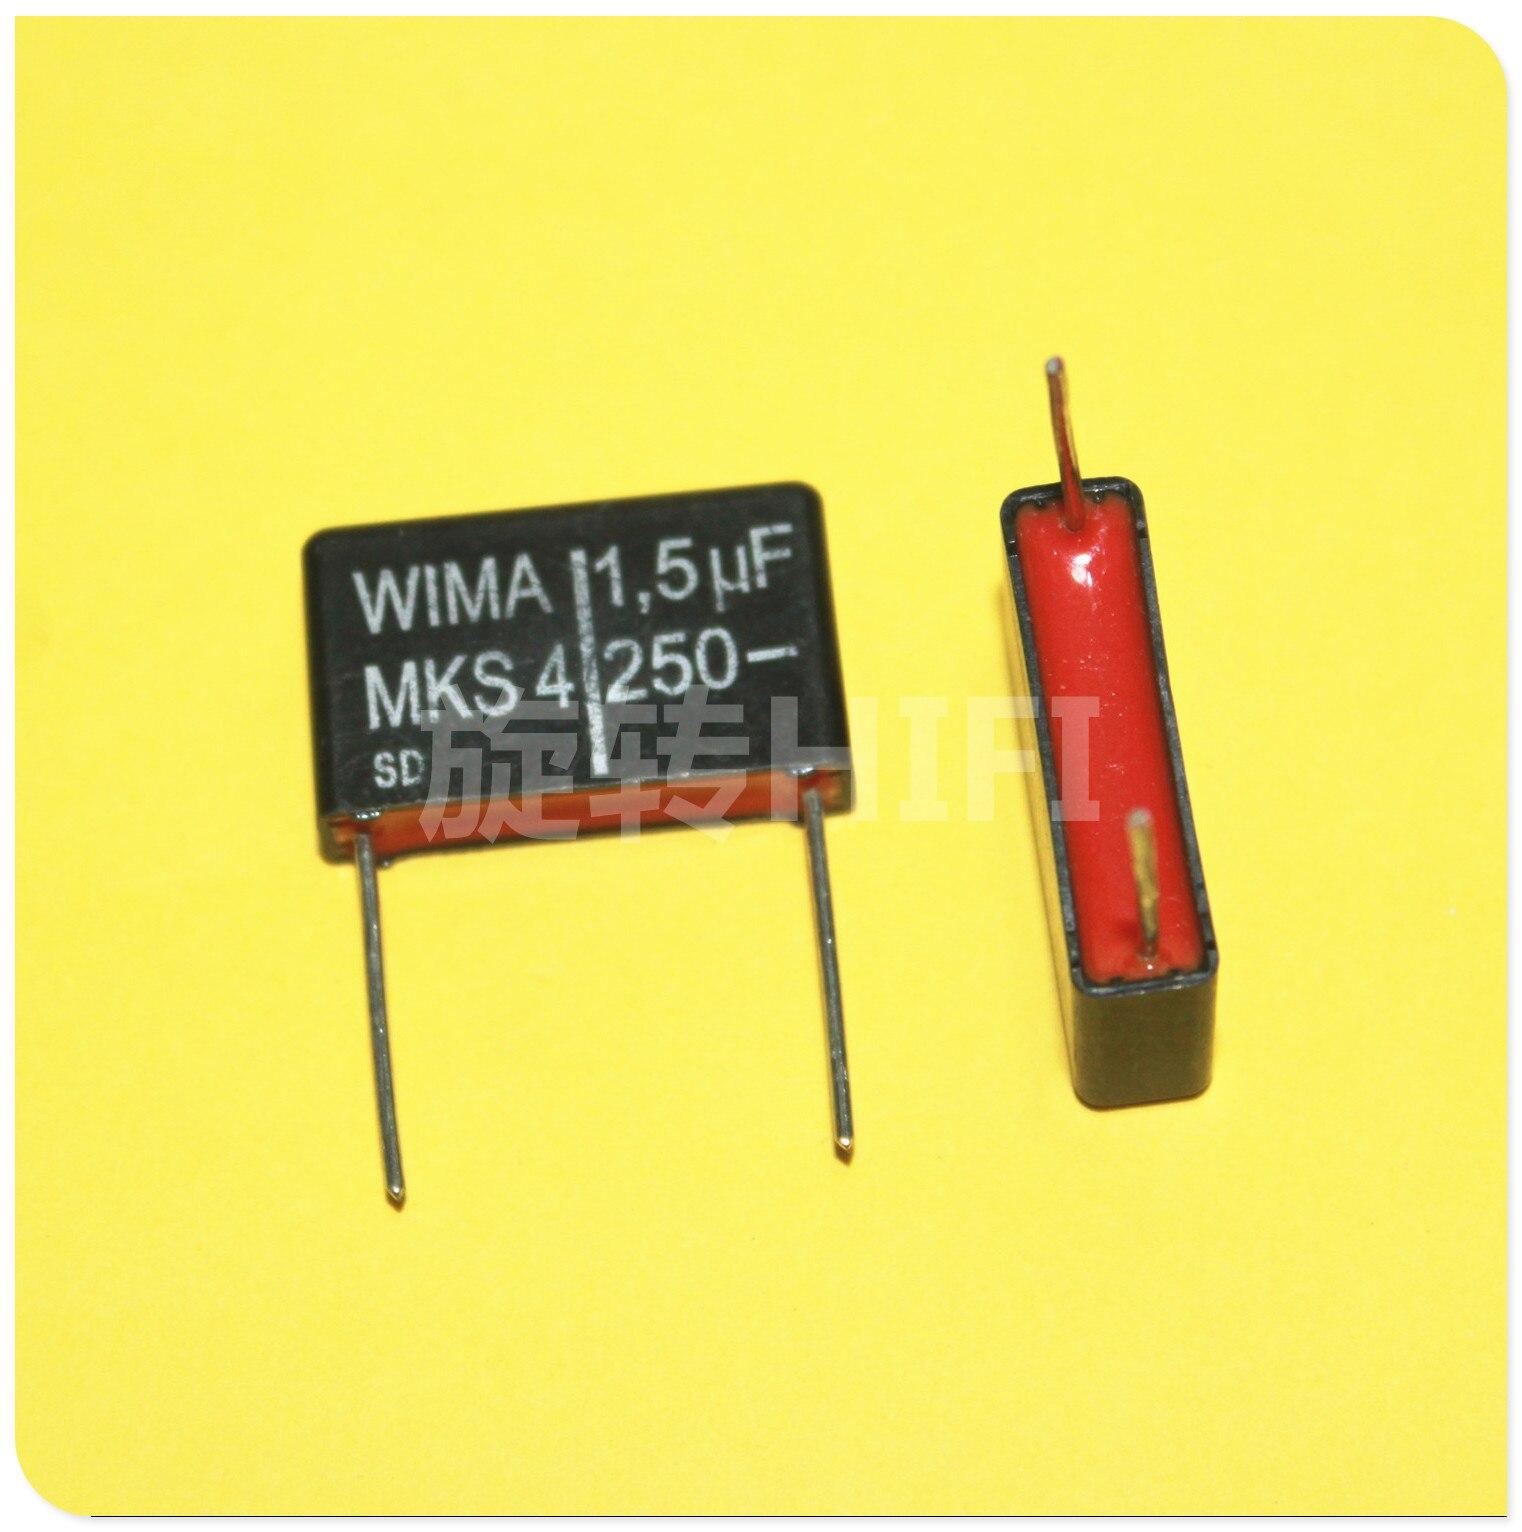 WIMA MKS4 P22MM MKP10 MKP4 MKC4 пленочный аудио конденсатор мкФ 1,5 мкФ 2,2 мкФ 3,3 мкФ 4,7 мкФ 5,6 мкФ 15 мкФ 250V 400V 160V 63V 100V красный| |   - AliExpress